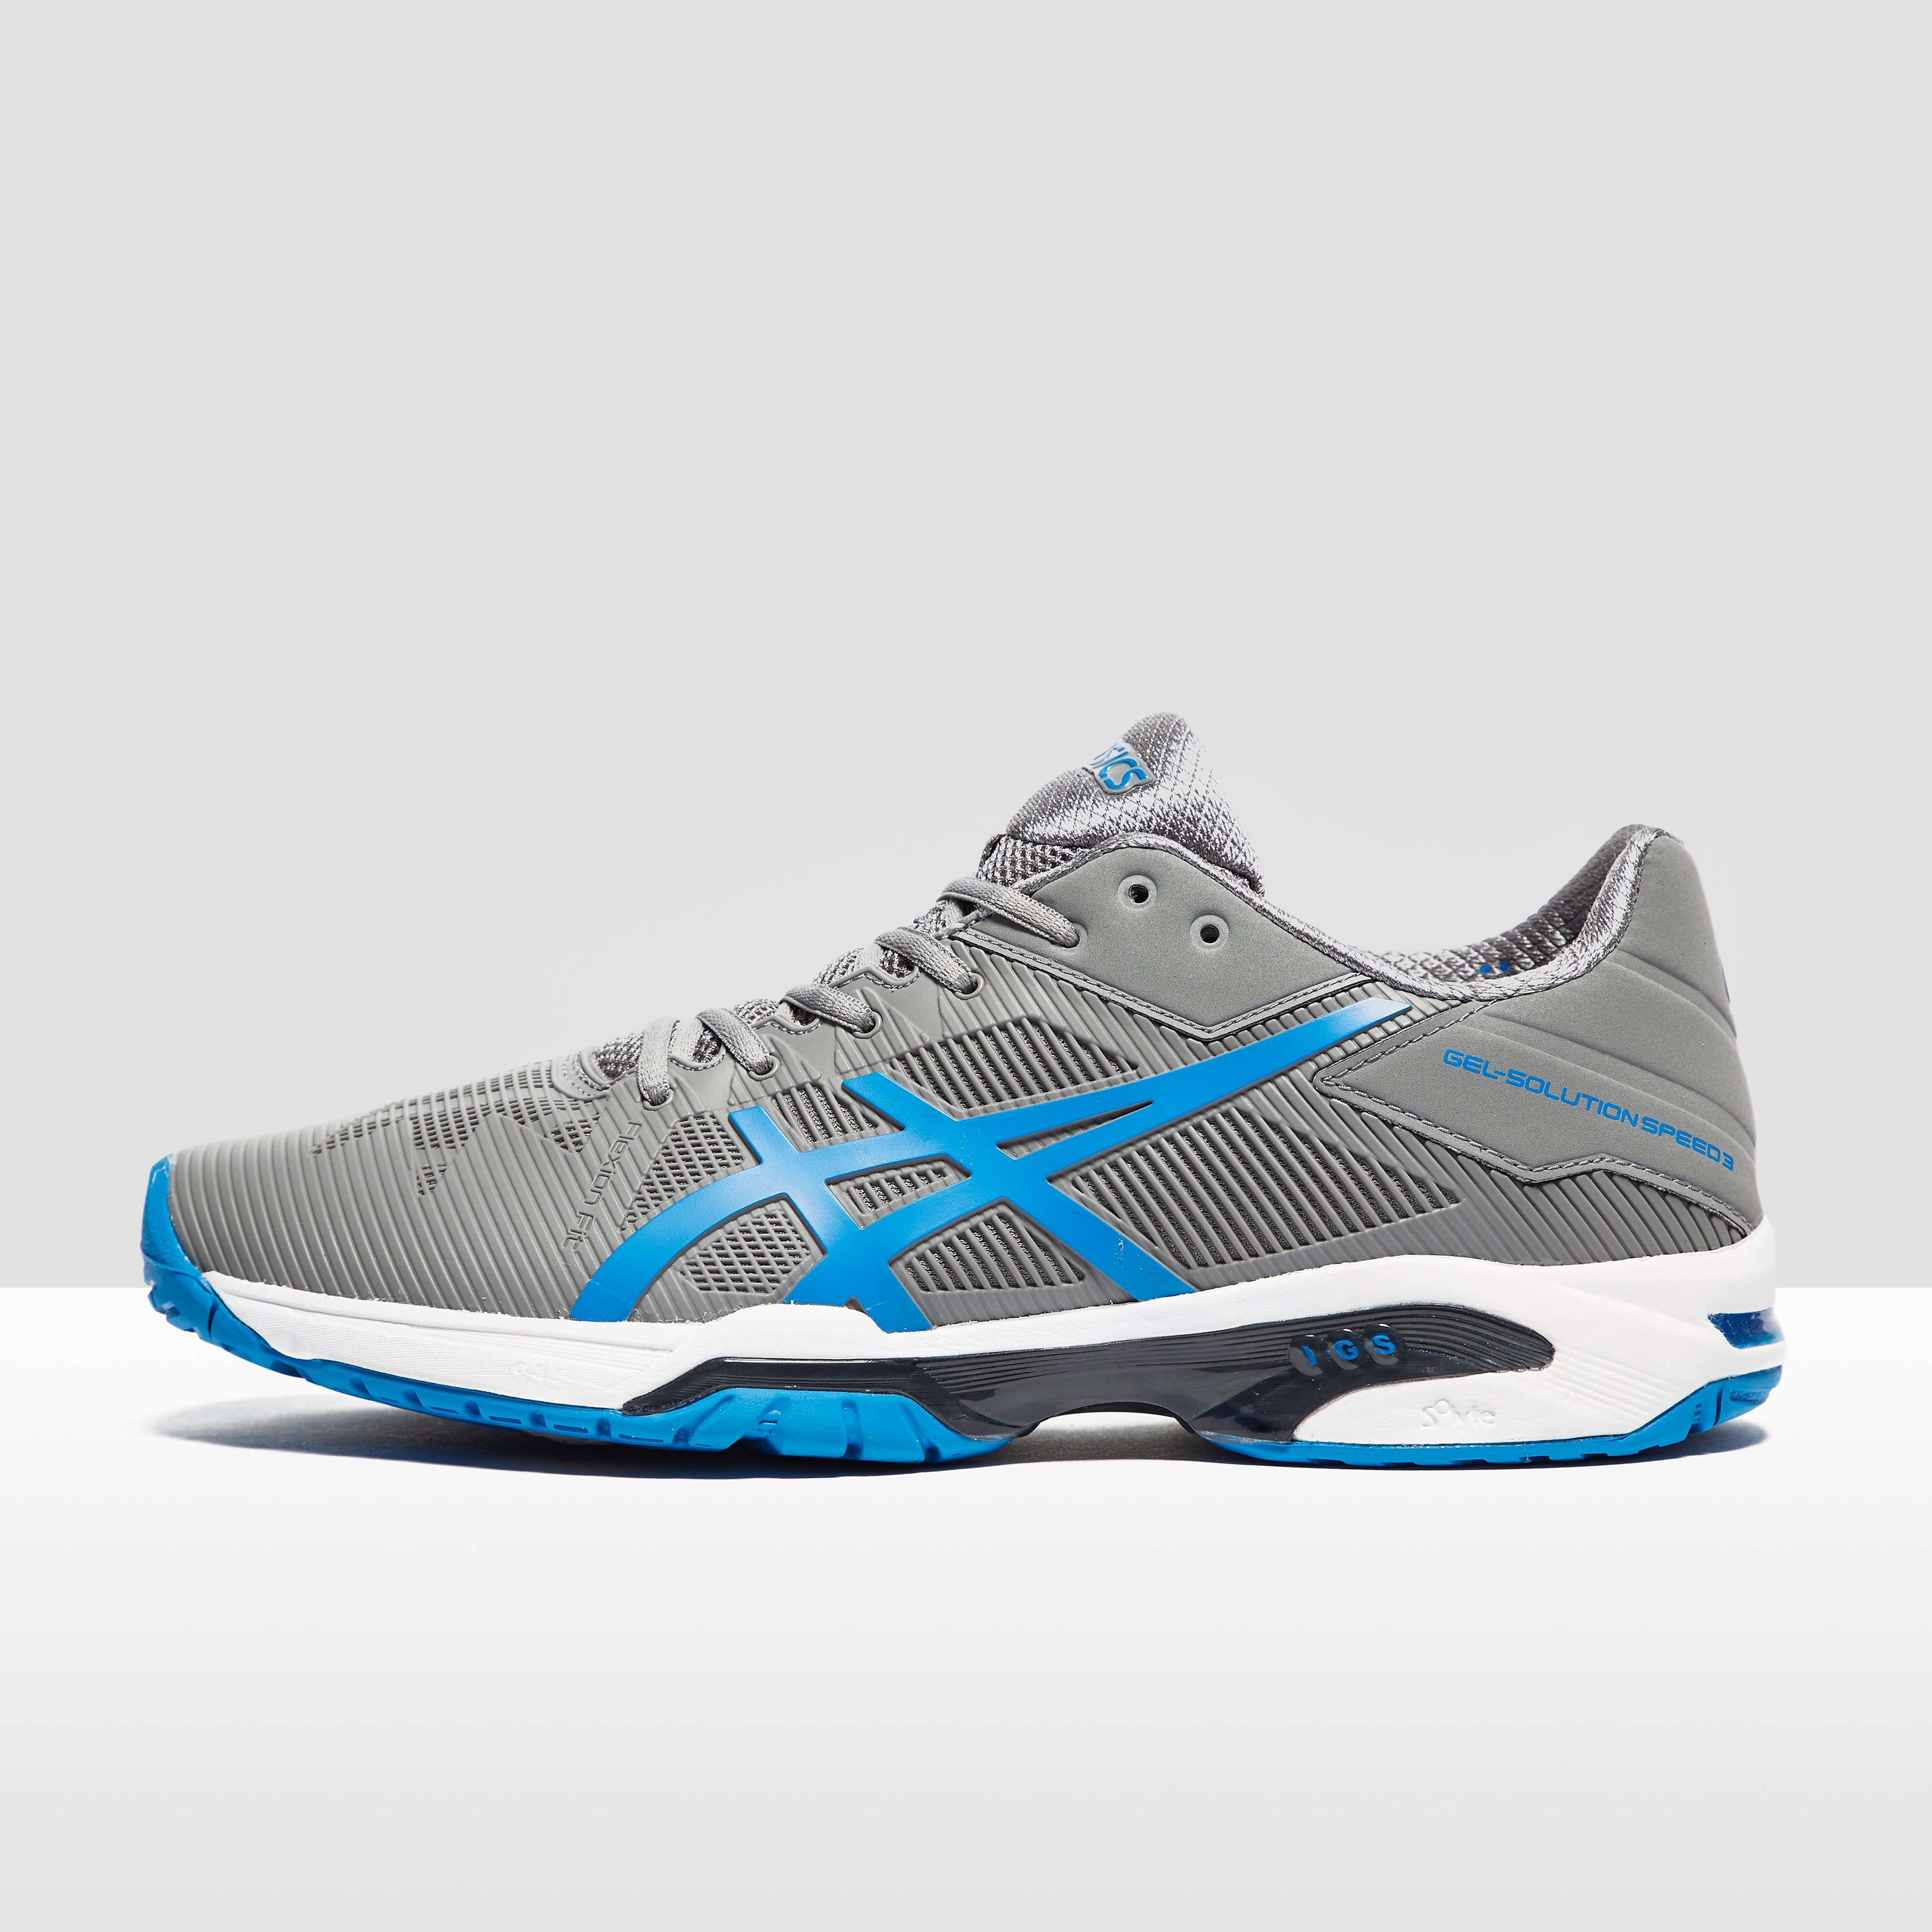 ASICS Gel-Solution Speed 3 Men's Tennis Shoes